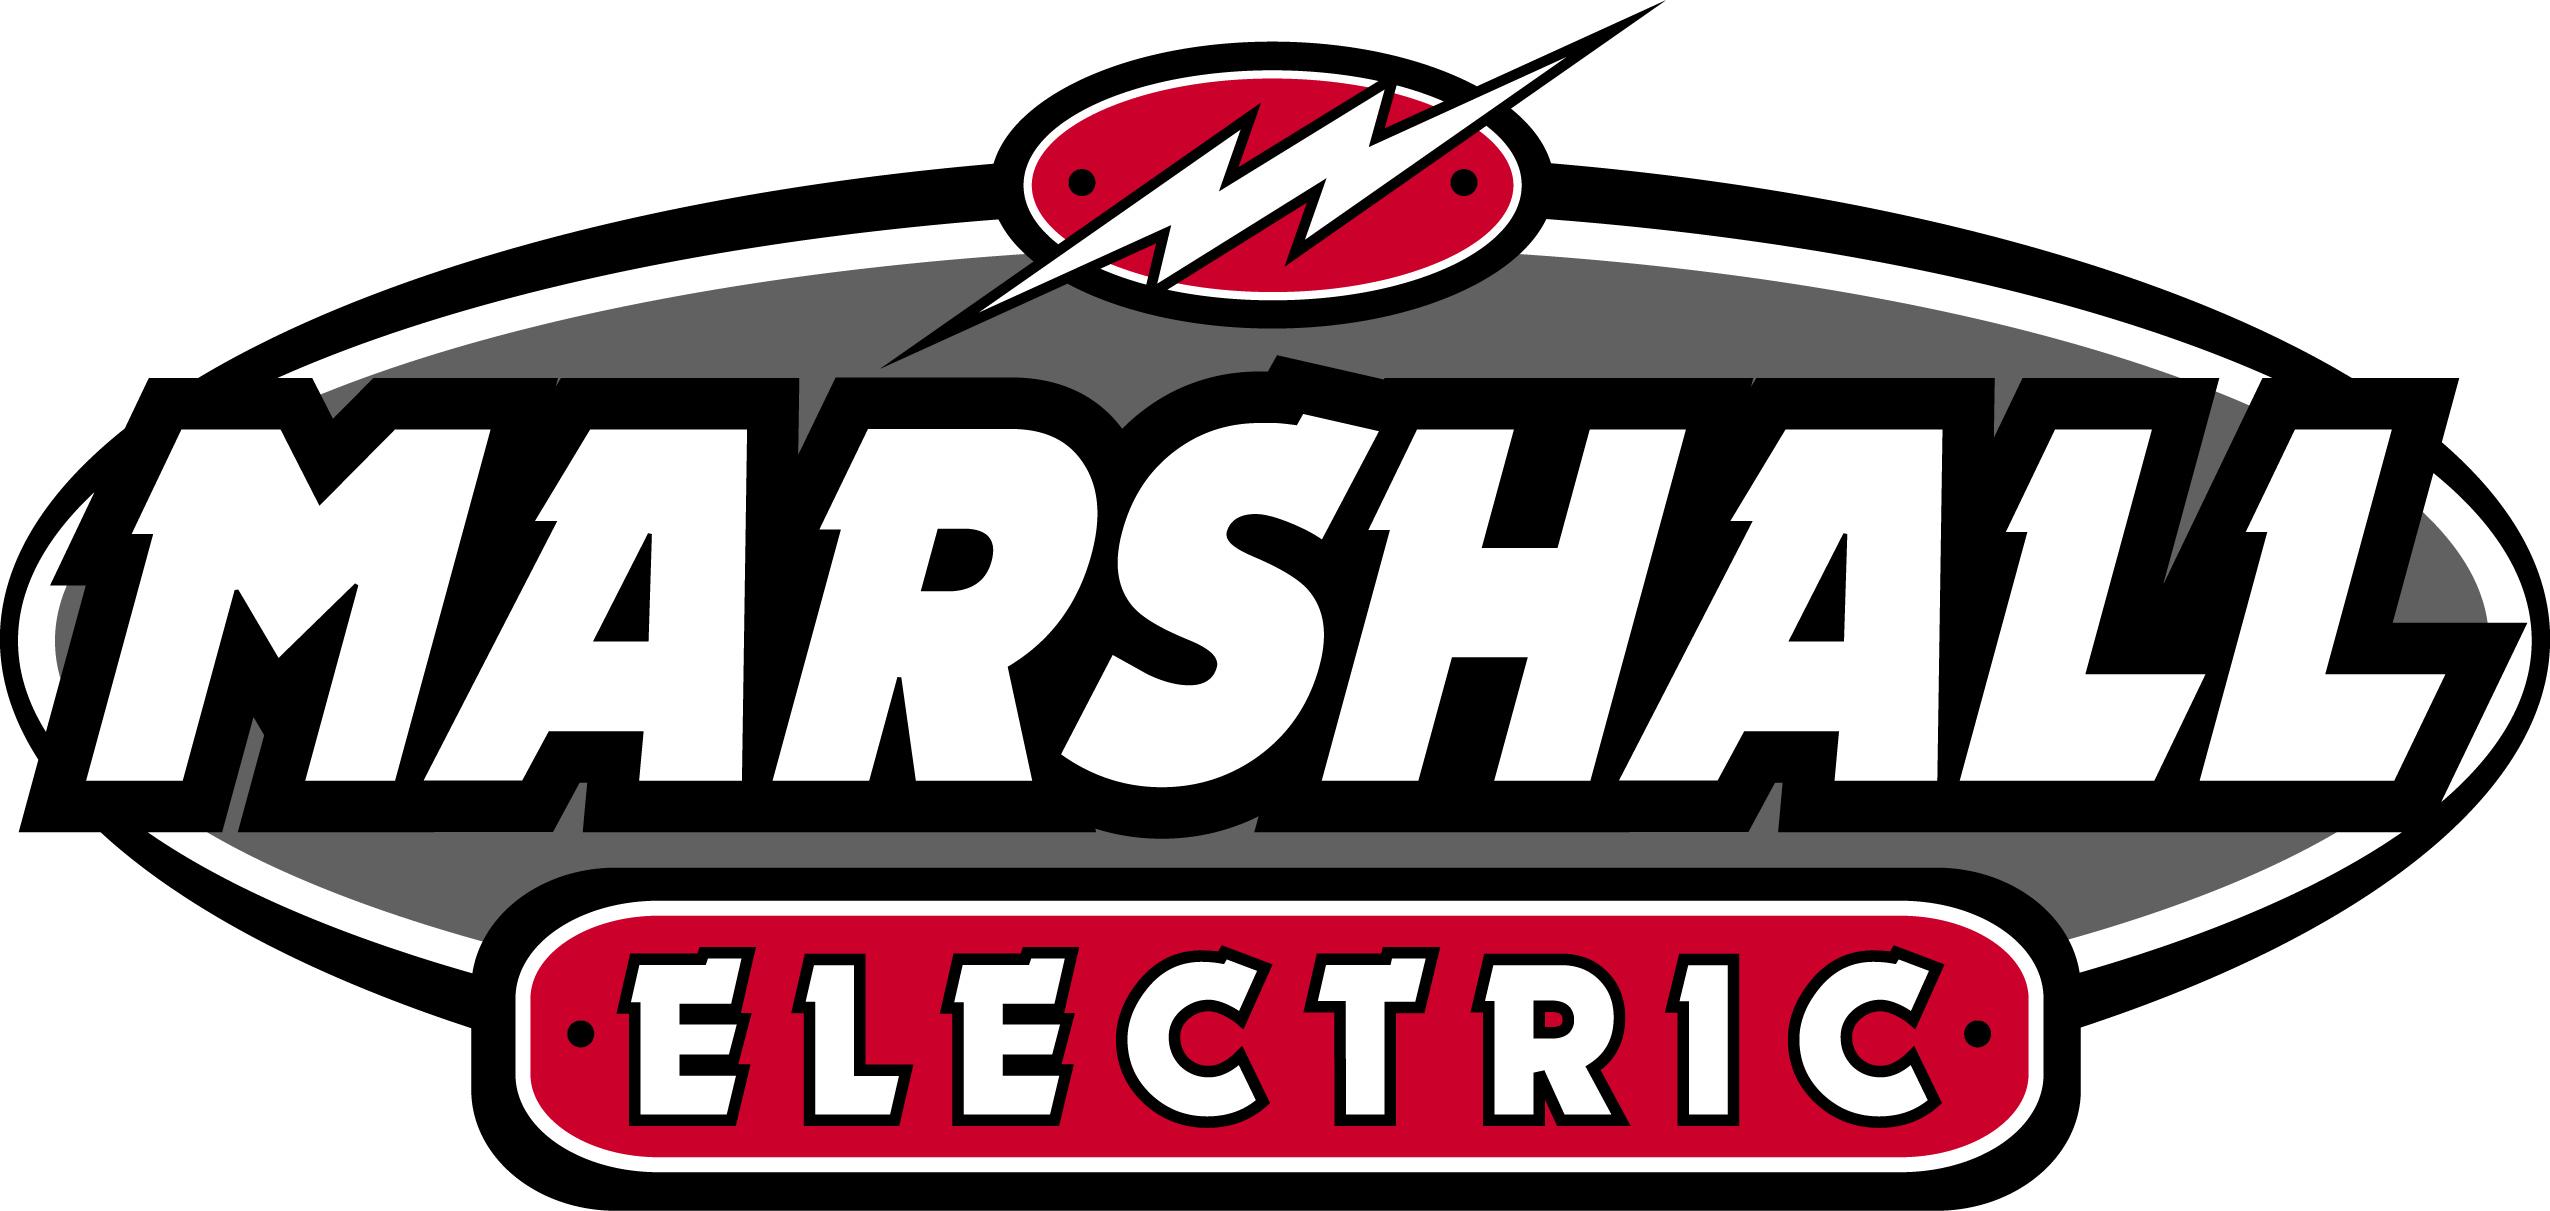 Marshall Electric, Inc.